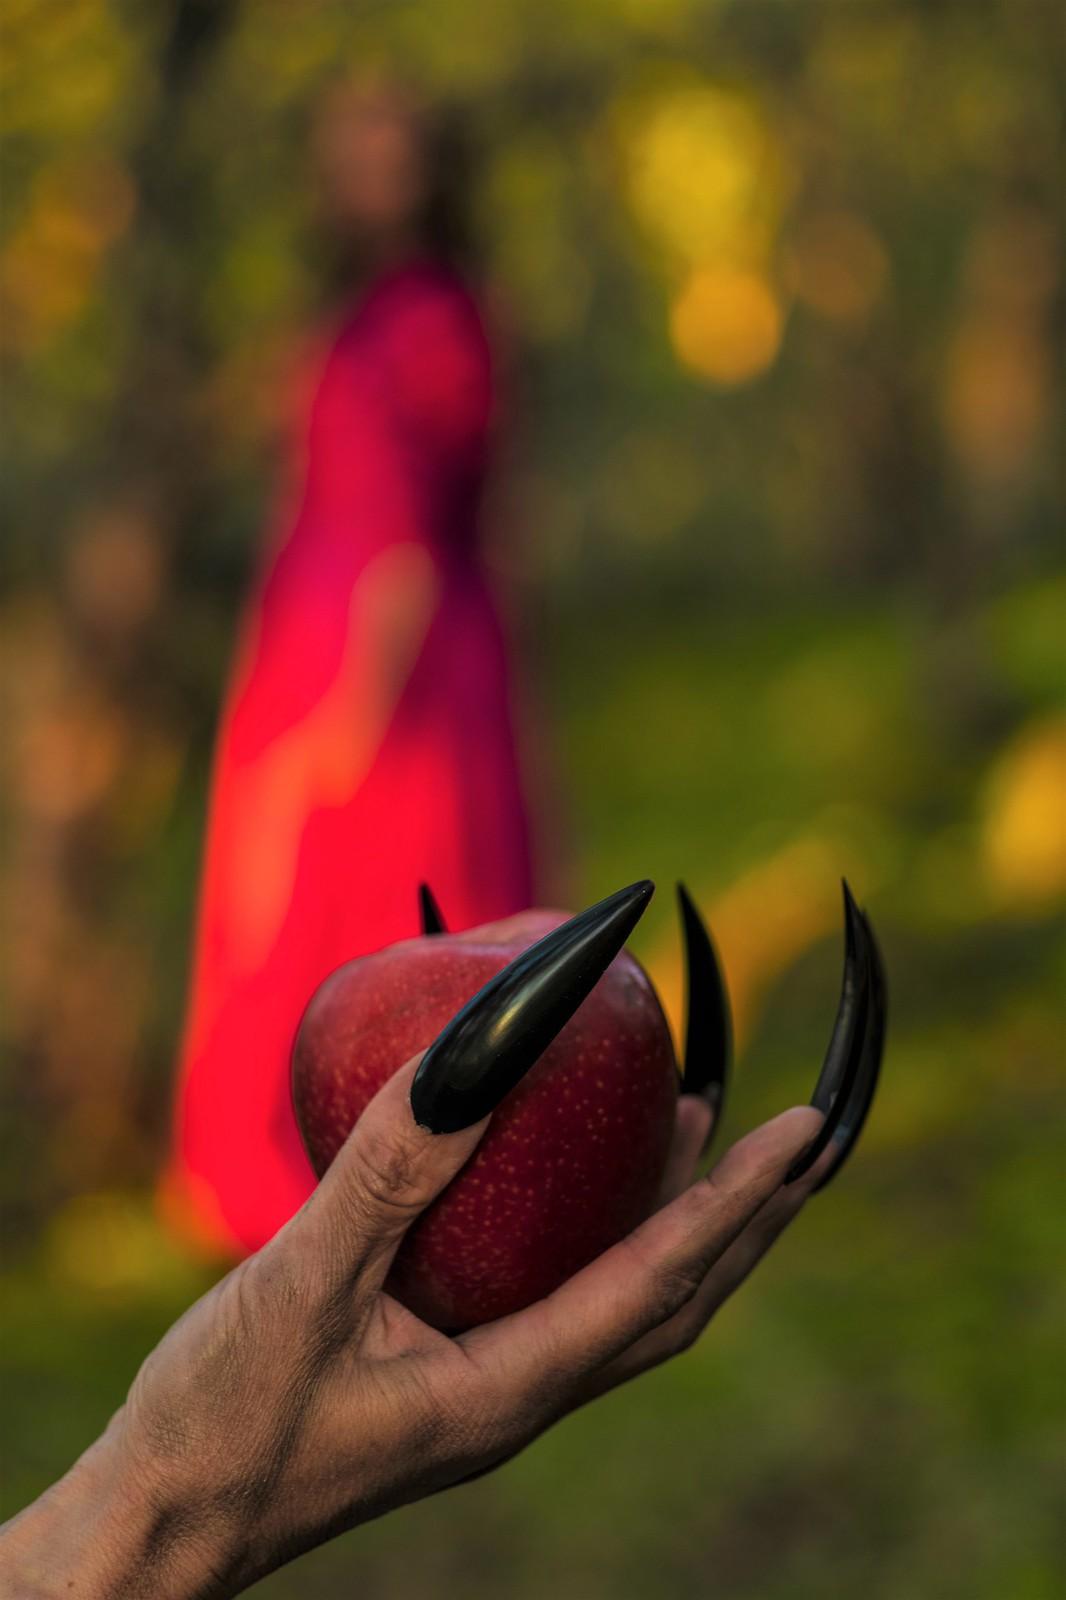 Vil du ha et eple snøhvit? Do you want an apple snow white?